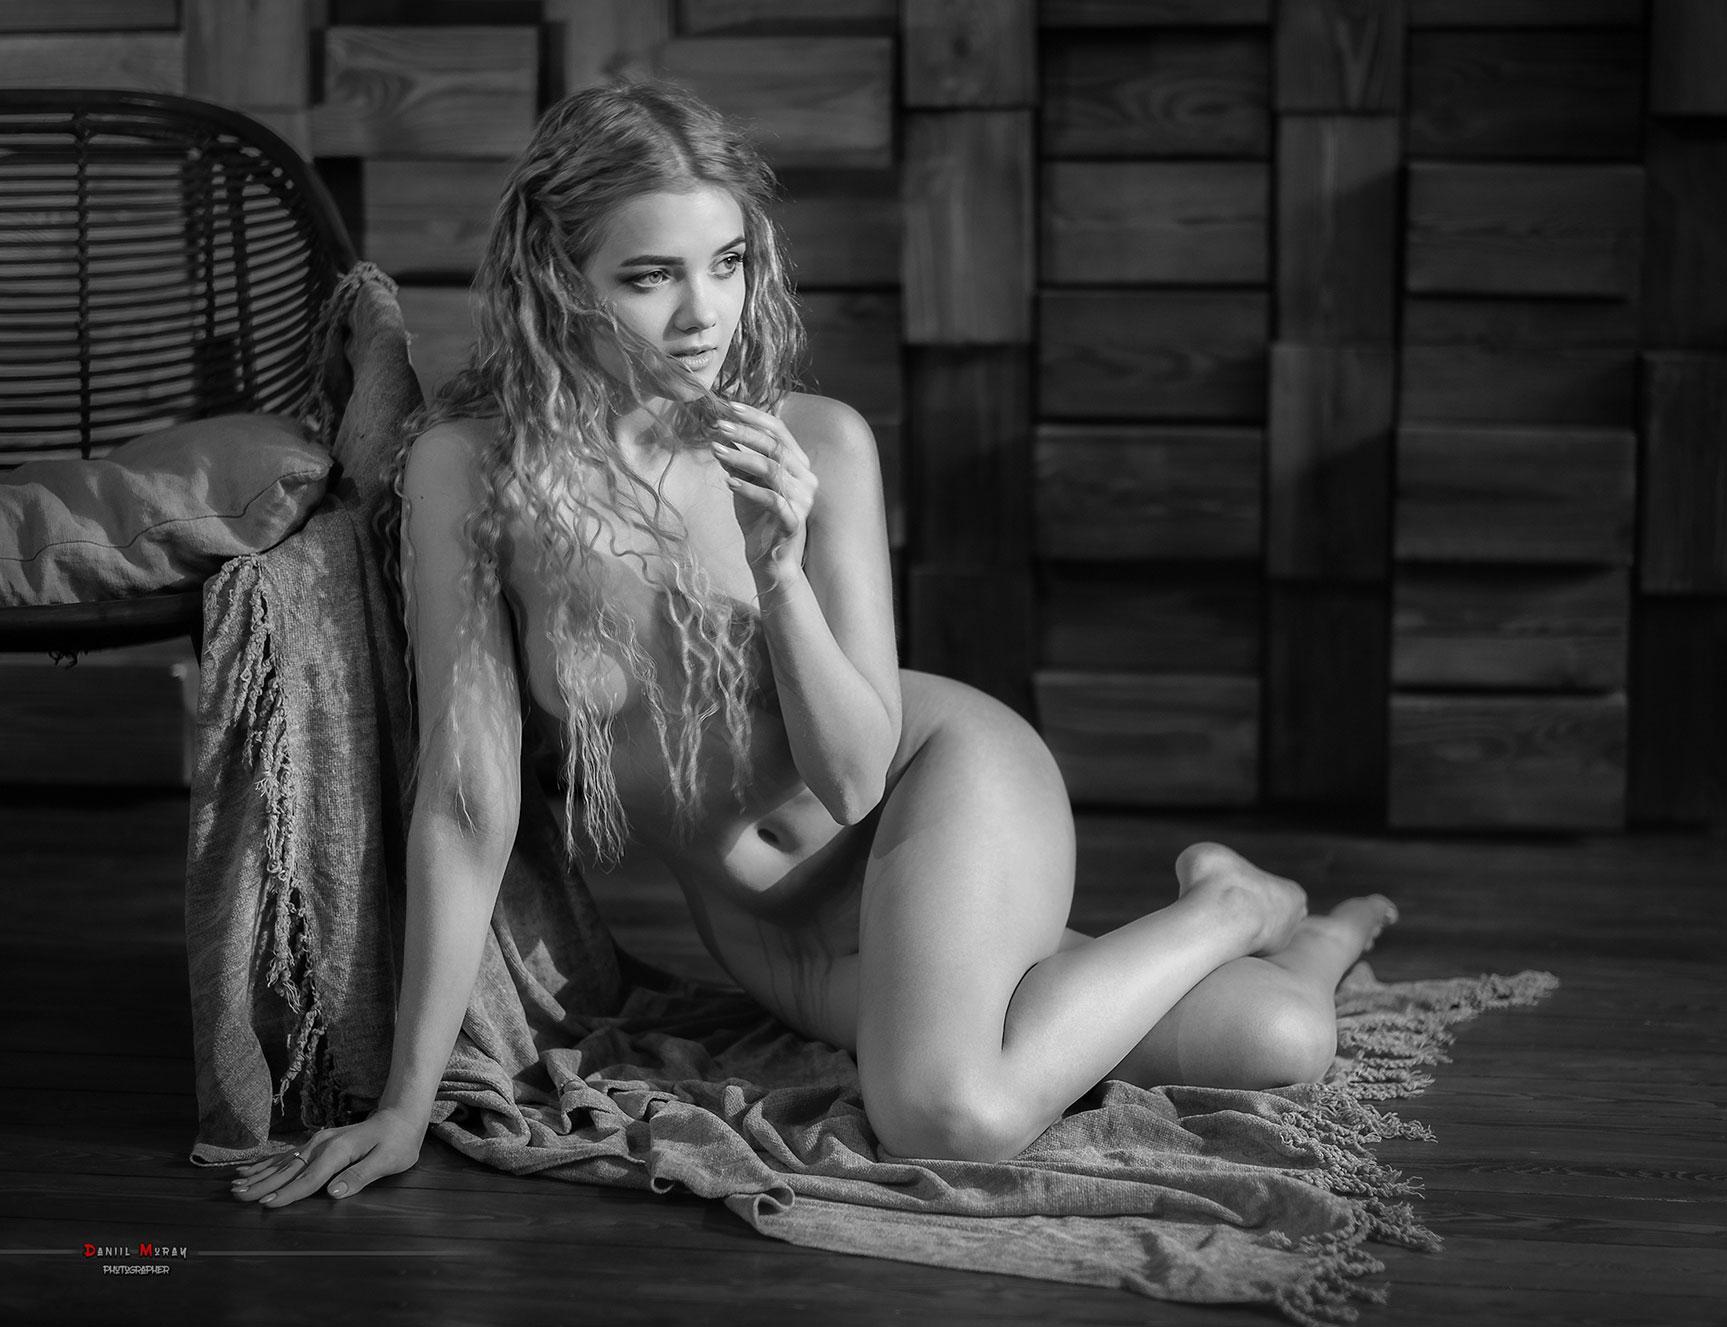 Виктория Соколова / Victoria Sokolova nude by Daniil Muray